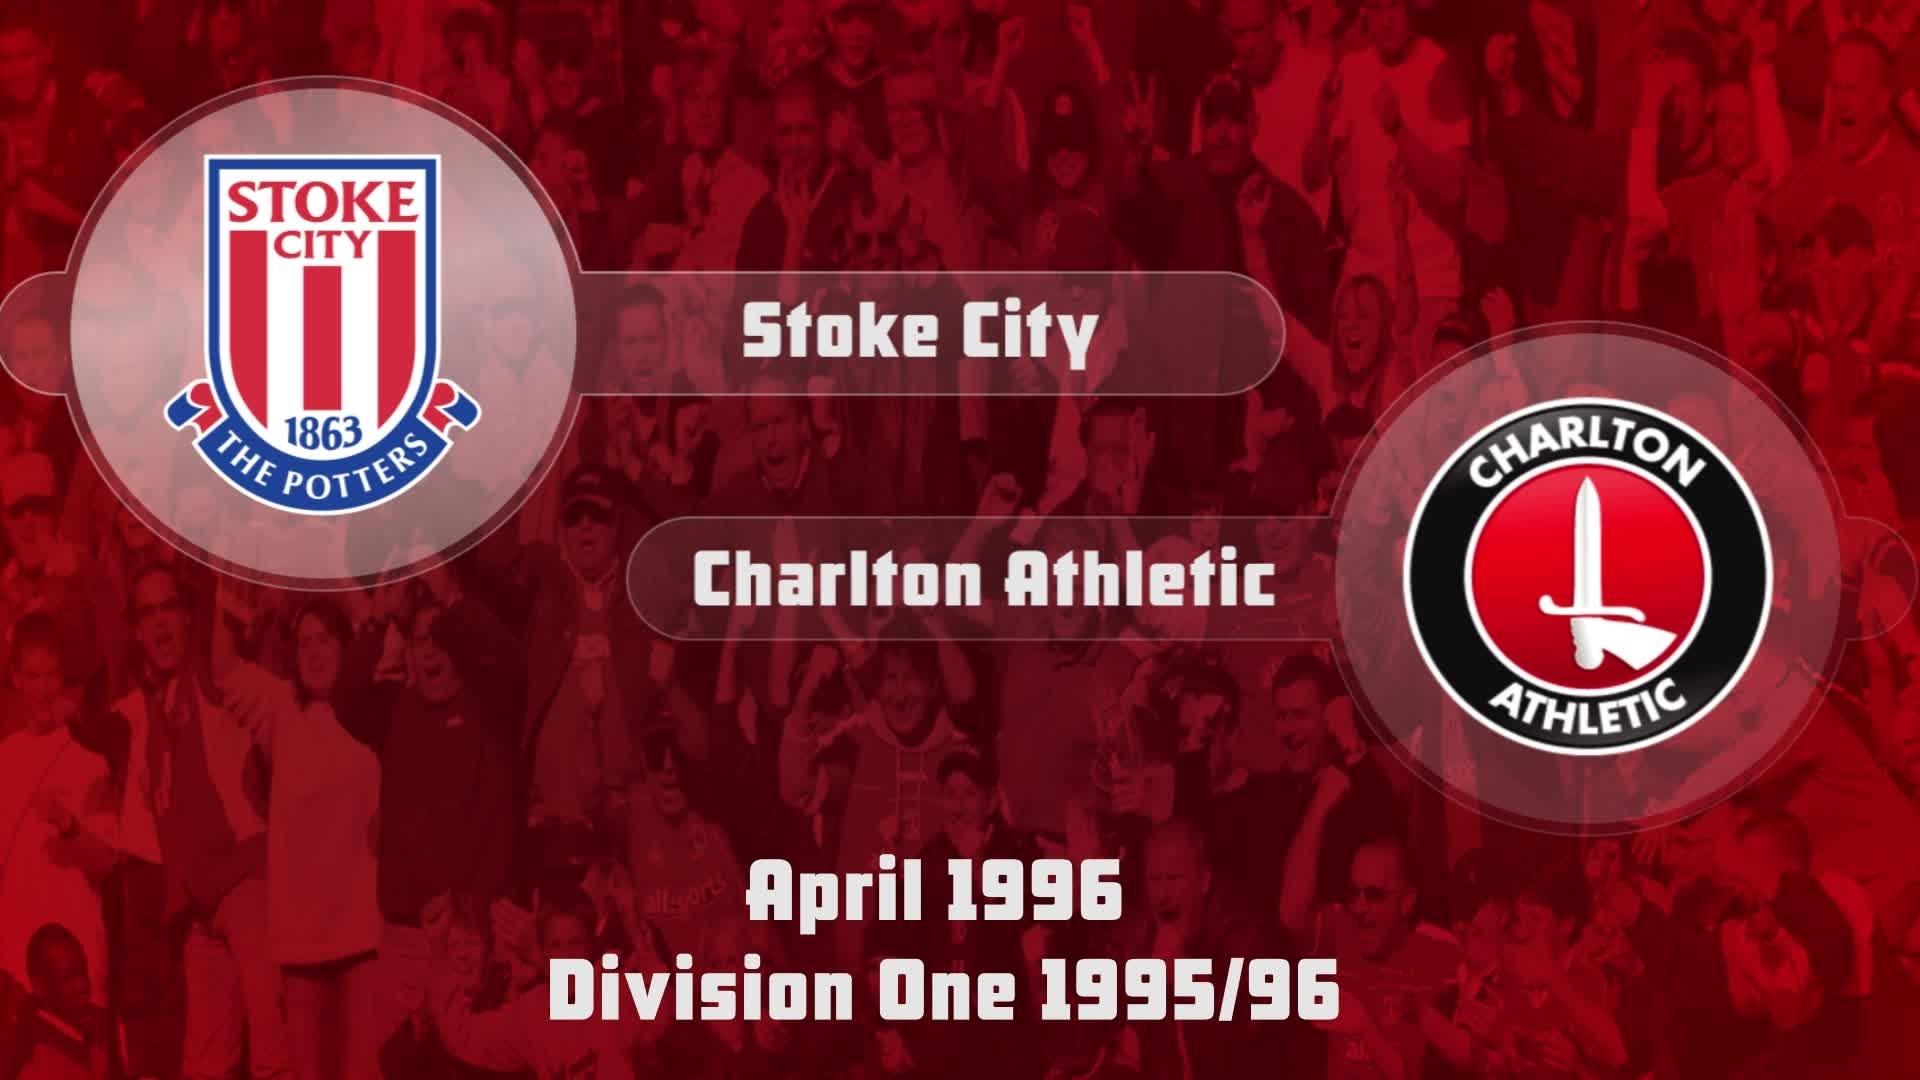 51 HIGHLIGHTS | Stoke City 1 Charlton 0 (April 1996)